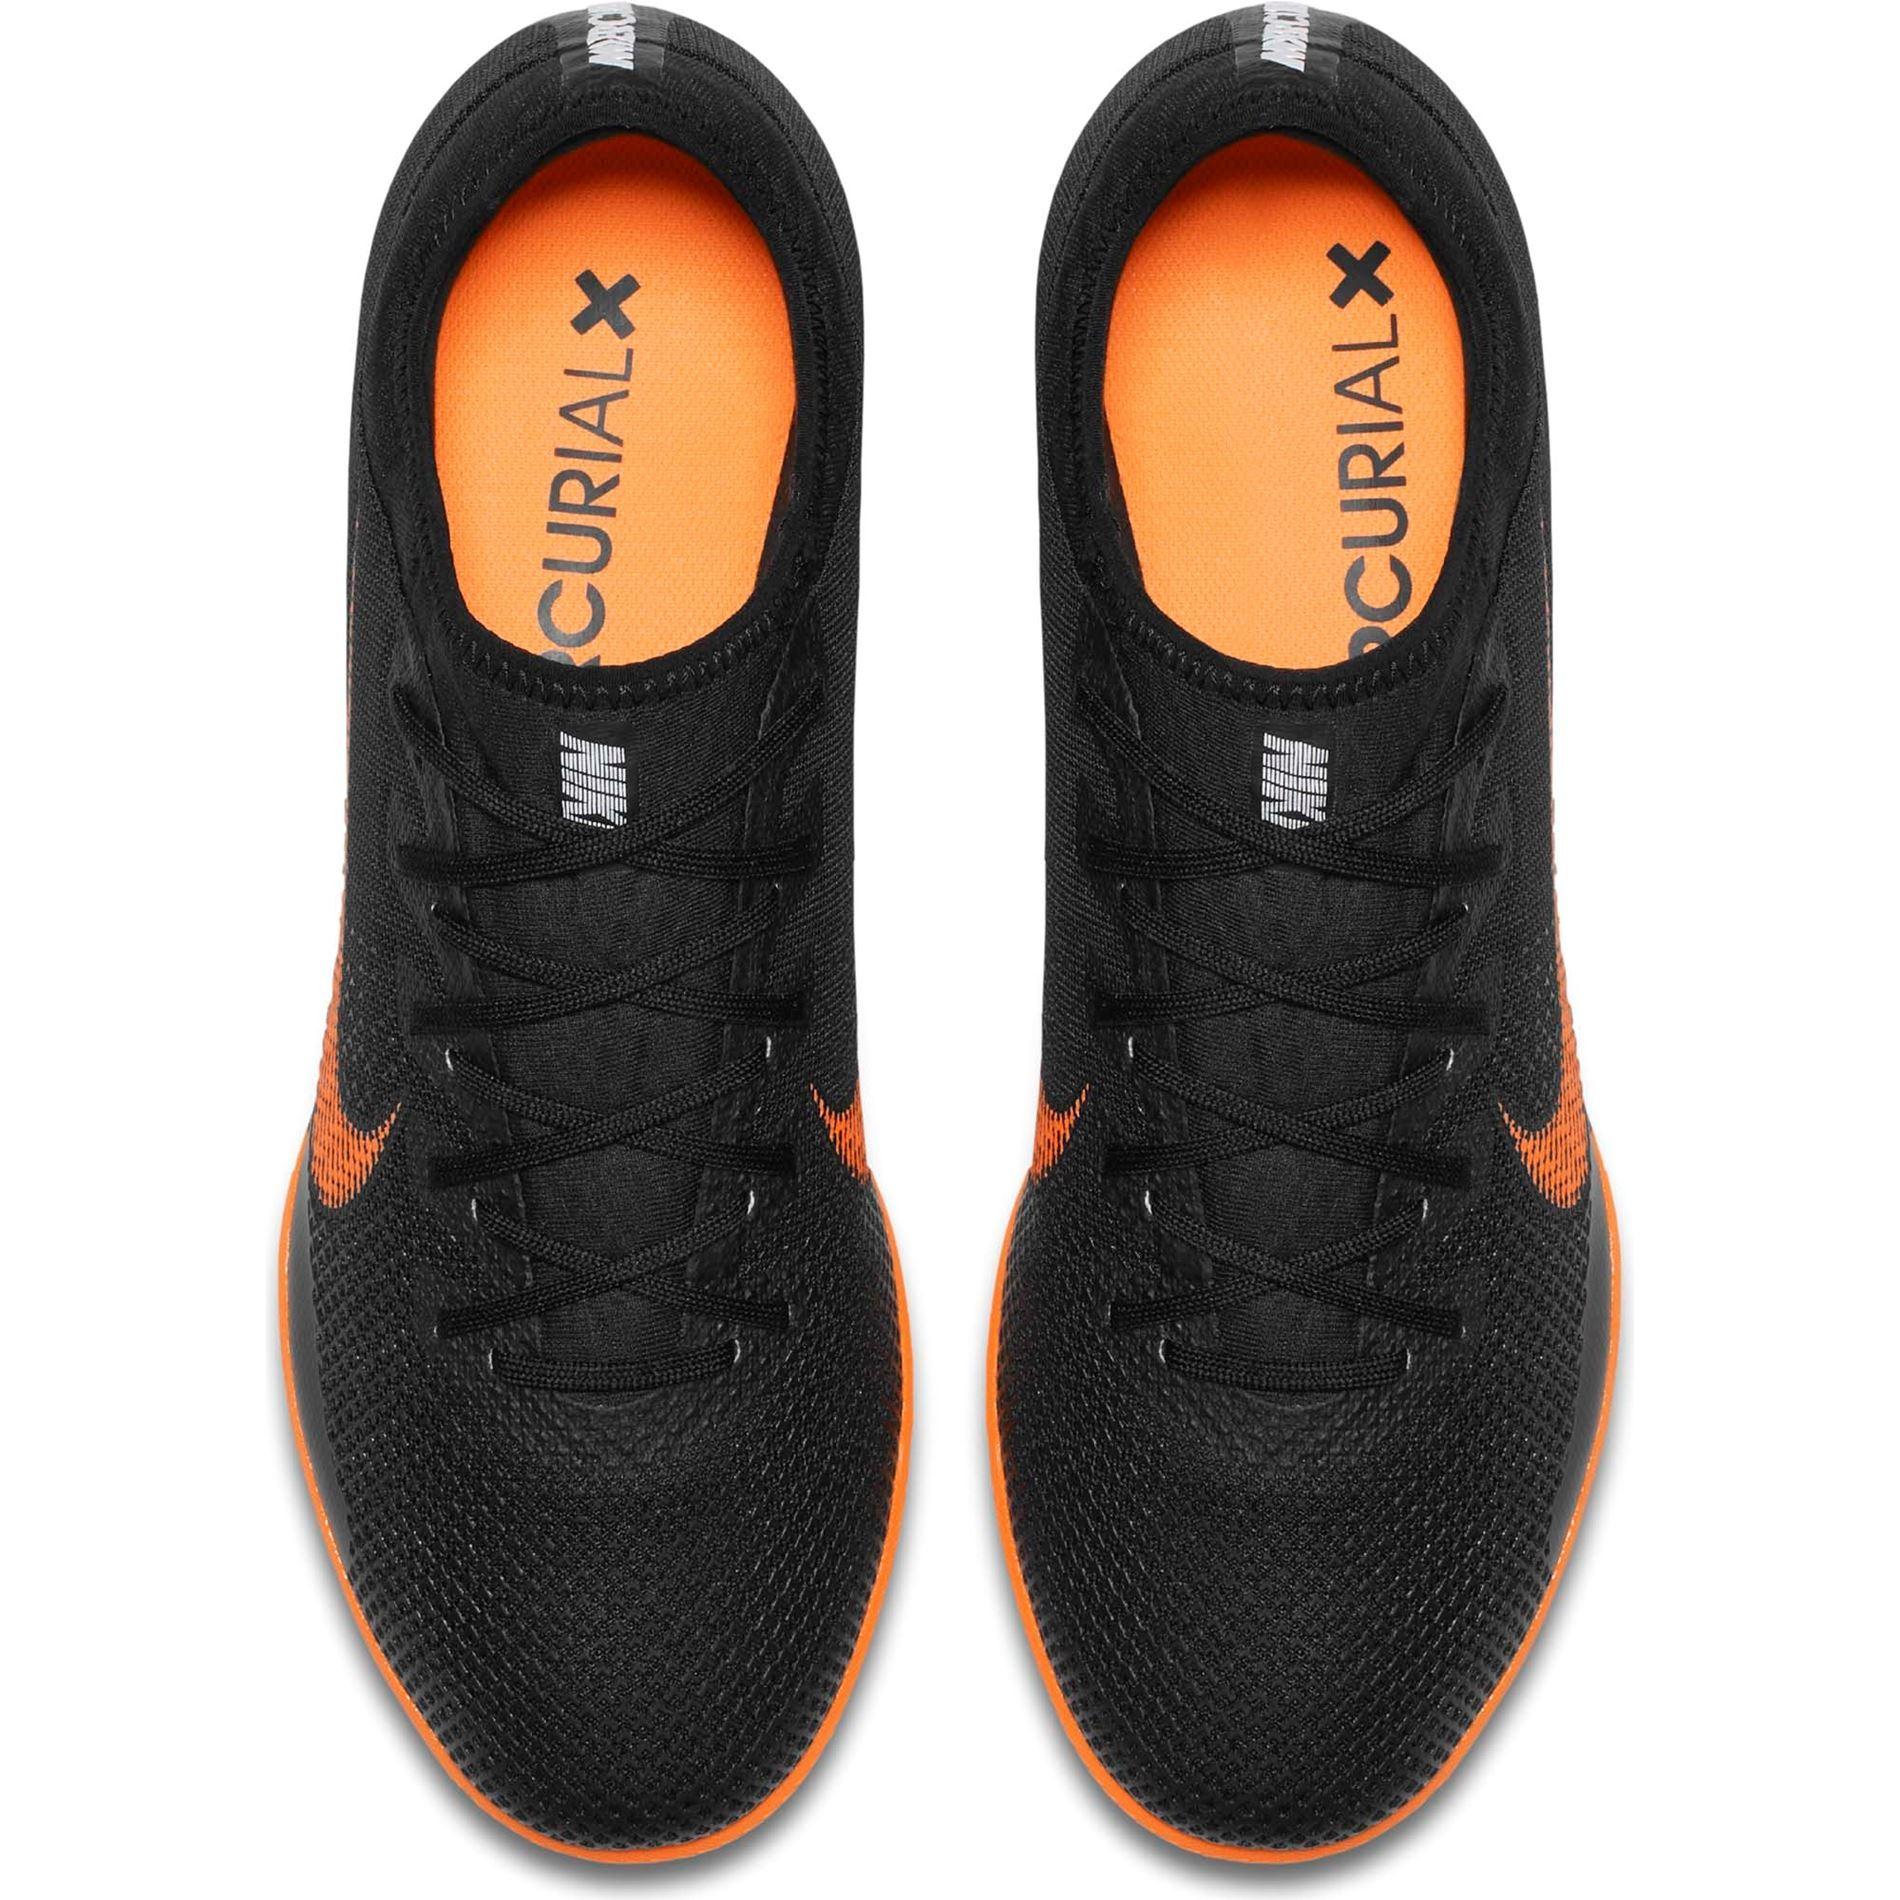 separation shoes ac54a 82af7 Nike MercurialX Vapor XII Pro IC Fast AF- Fotballsko.no - Sko fra Adidas,  Nike og Puma. Nor-Contact Sport